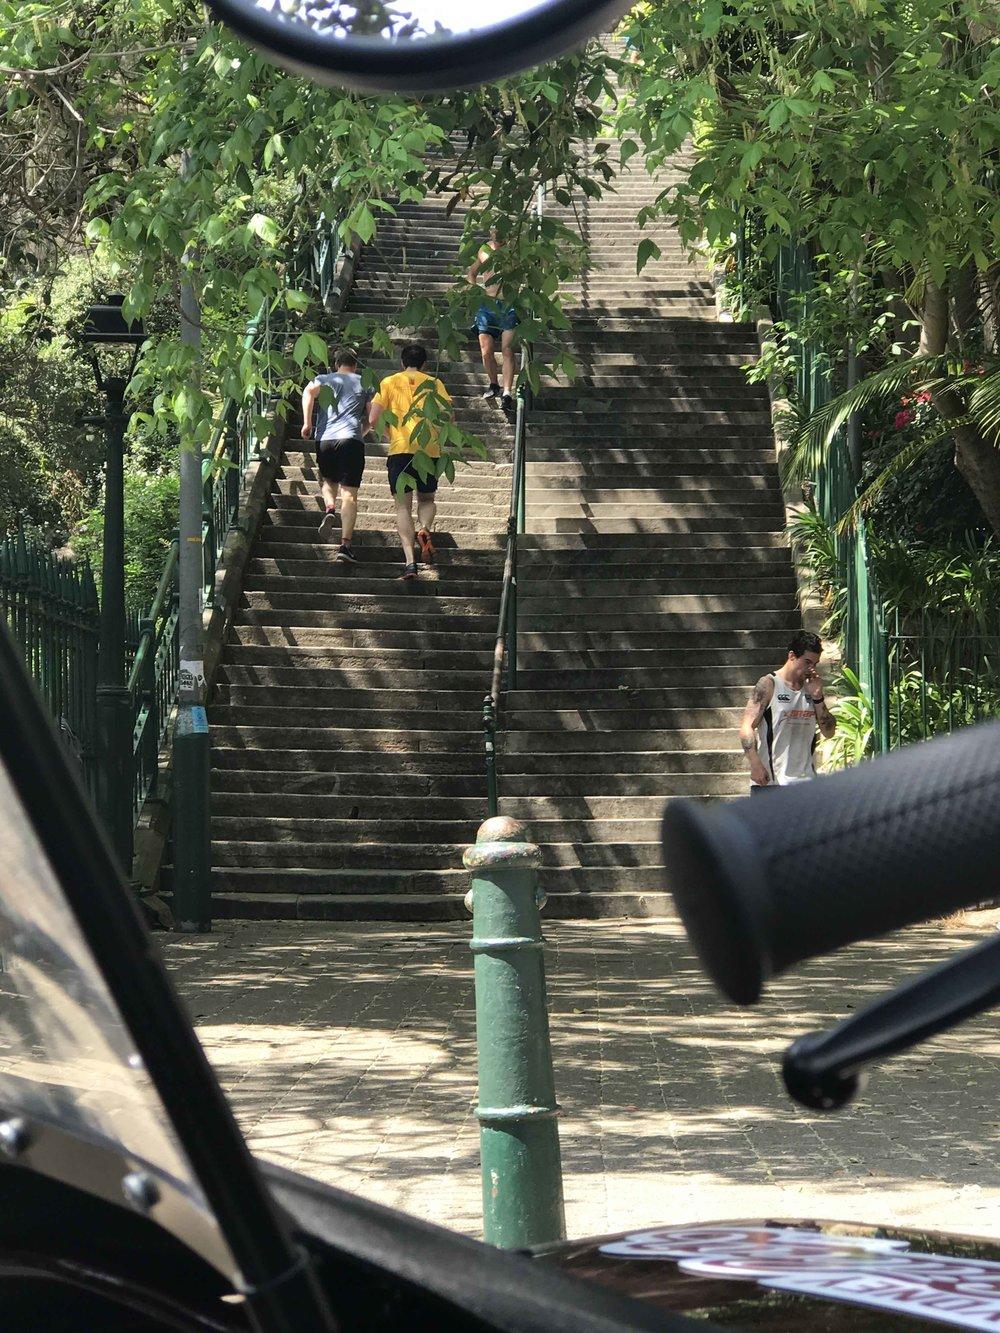 woolloomooloo-stairs-sydney-sidecar-experience-tours.jpg